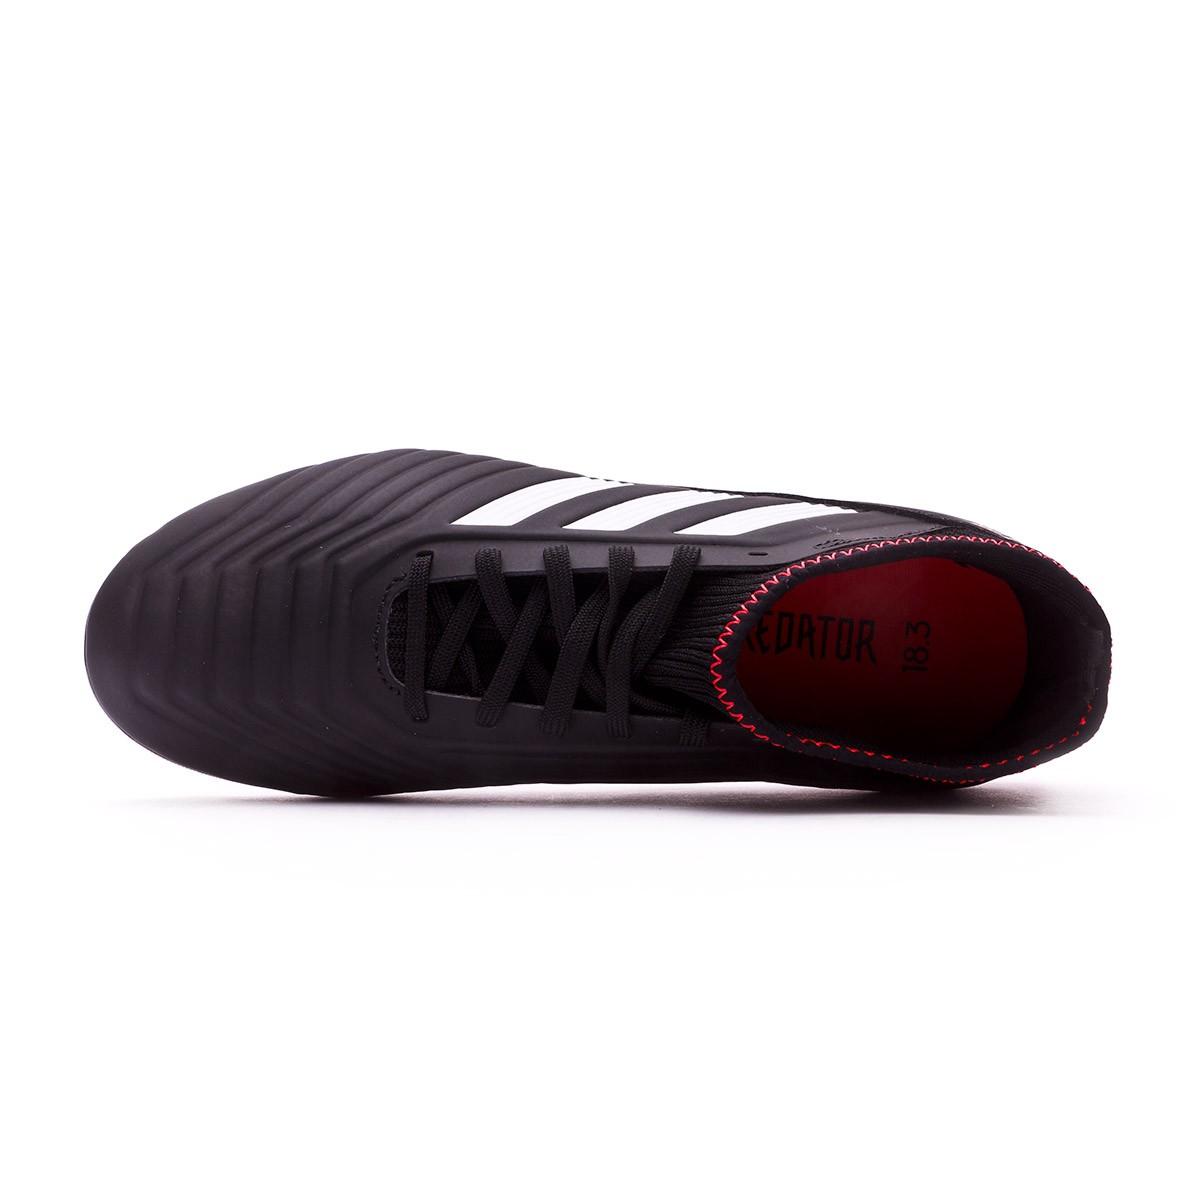 2640b13b23a Football Boots adidas Kids Predator 18.3 FG Core black-White-Gold  metallic-Solar red - Football store Fútbol Emotion